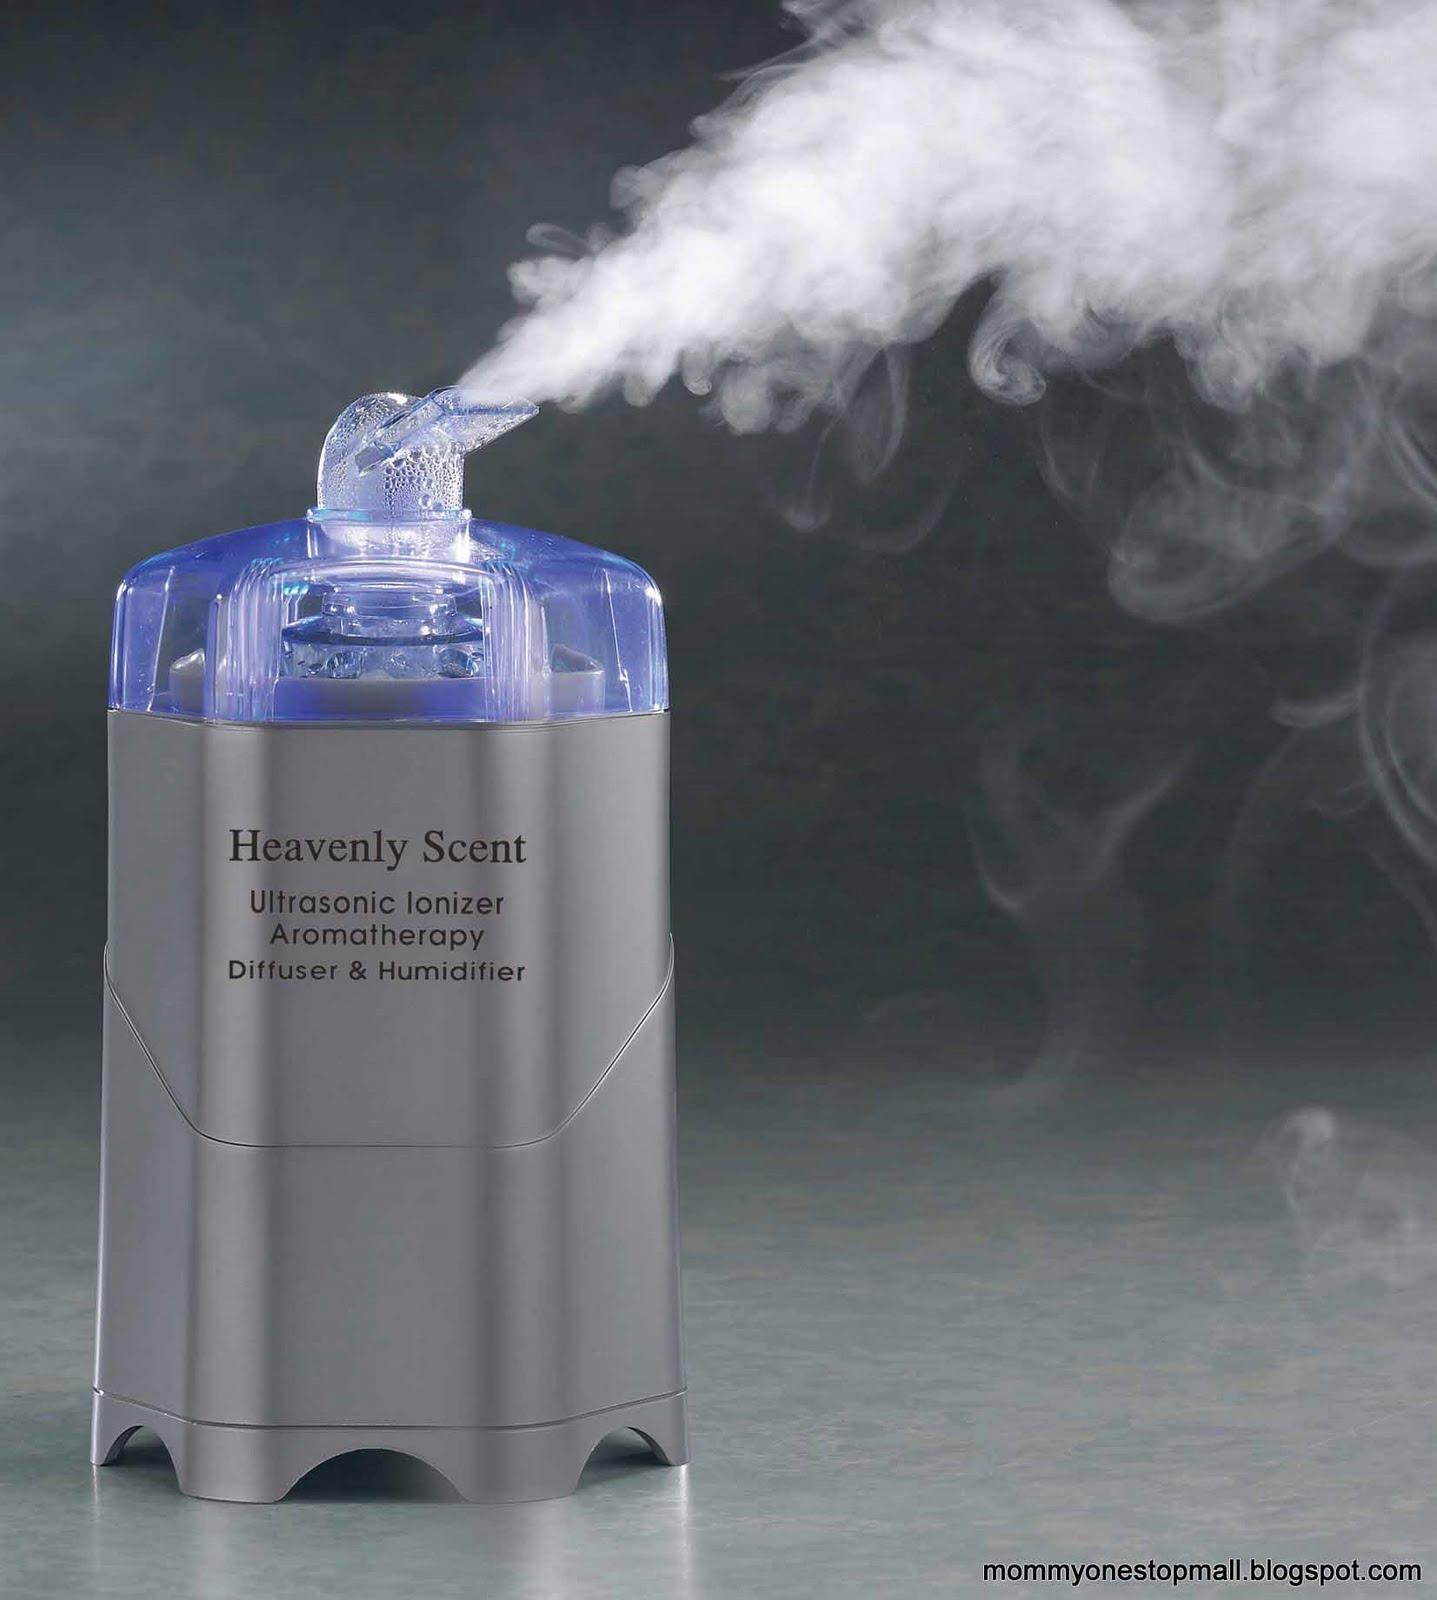 Best Ultrasonic Aromatherapy Diffuser ~ Mommyonestopmall ultrasonic ionizer aromatherapy diffuser